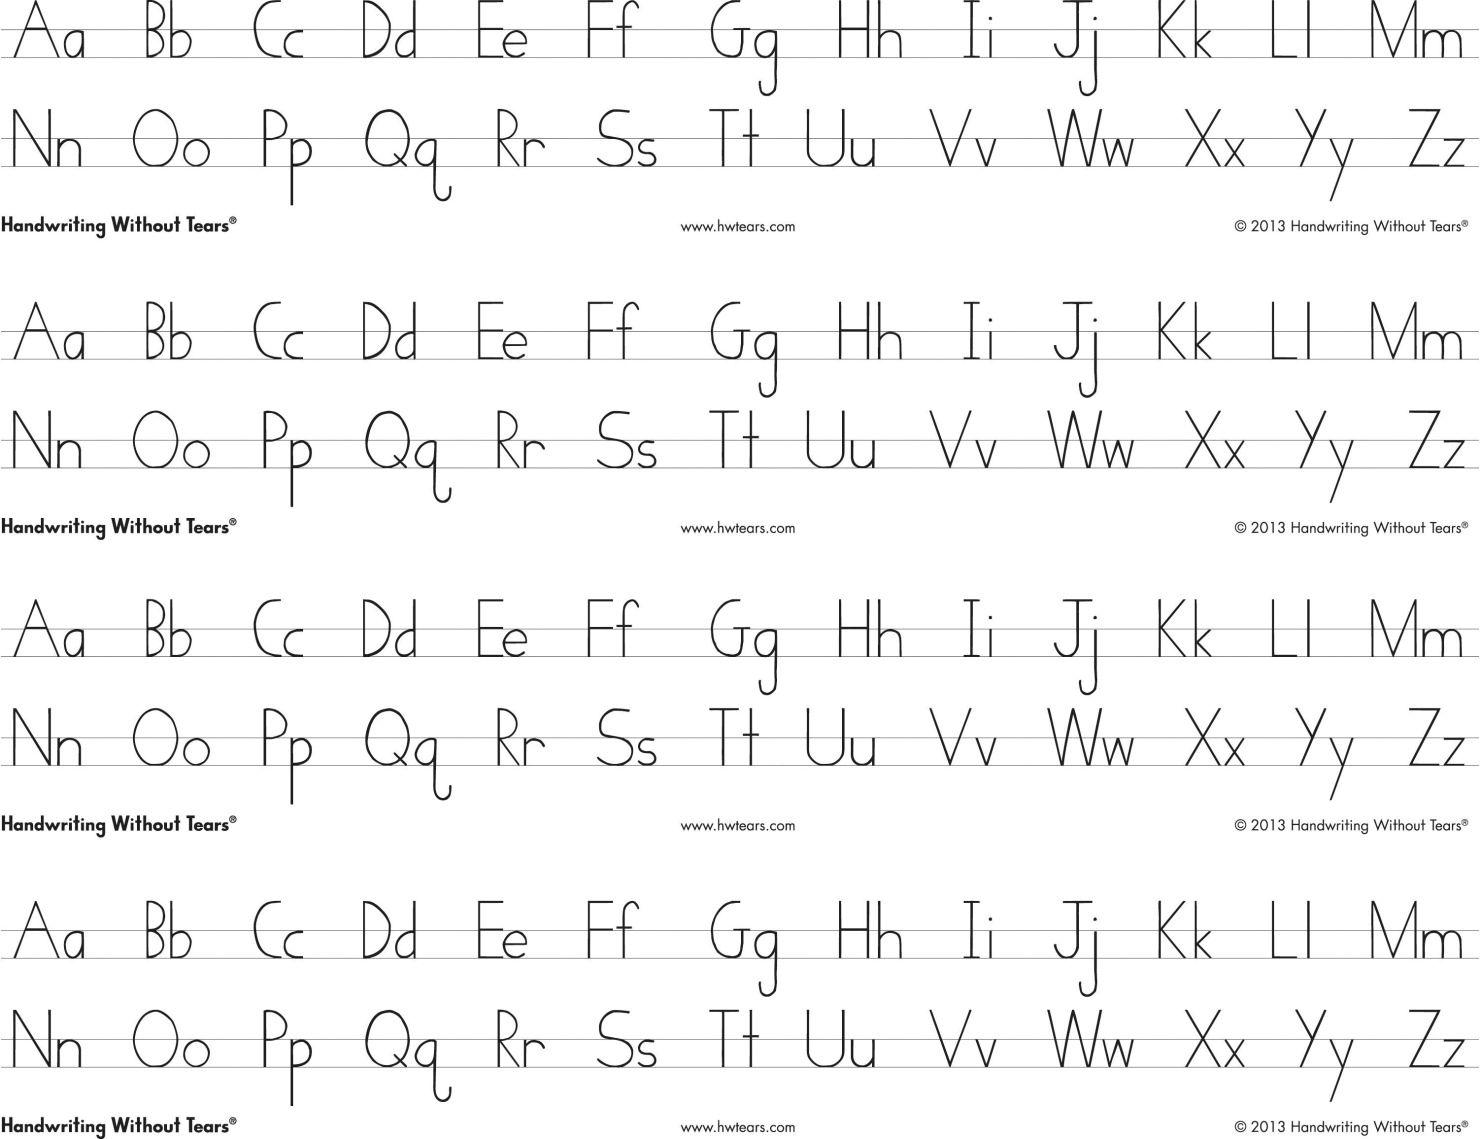 H Ndwrit G Without Te Rs Pr T Lph Bet Desk Sheets 4 Strips Per